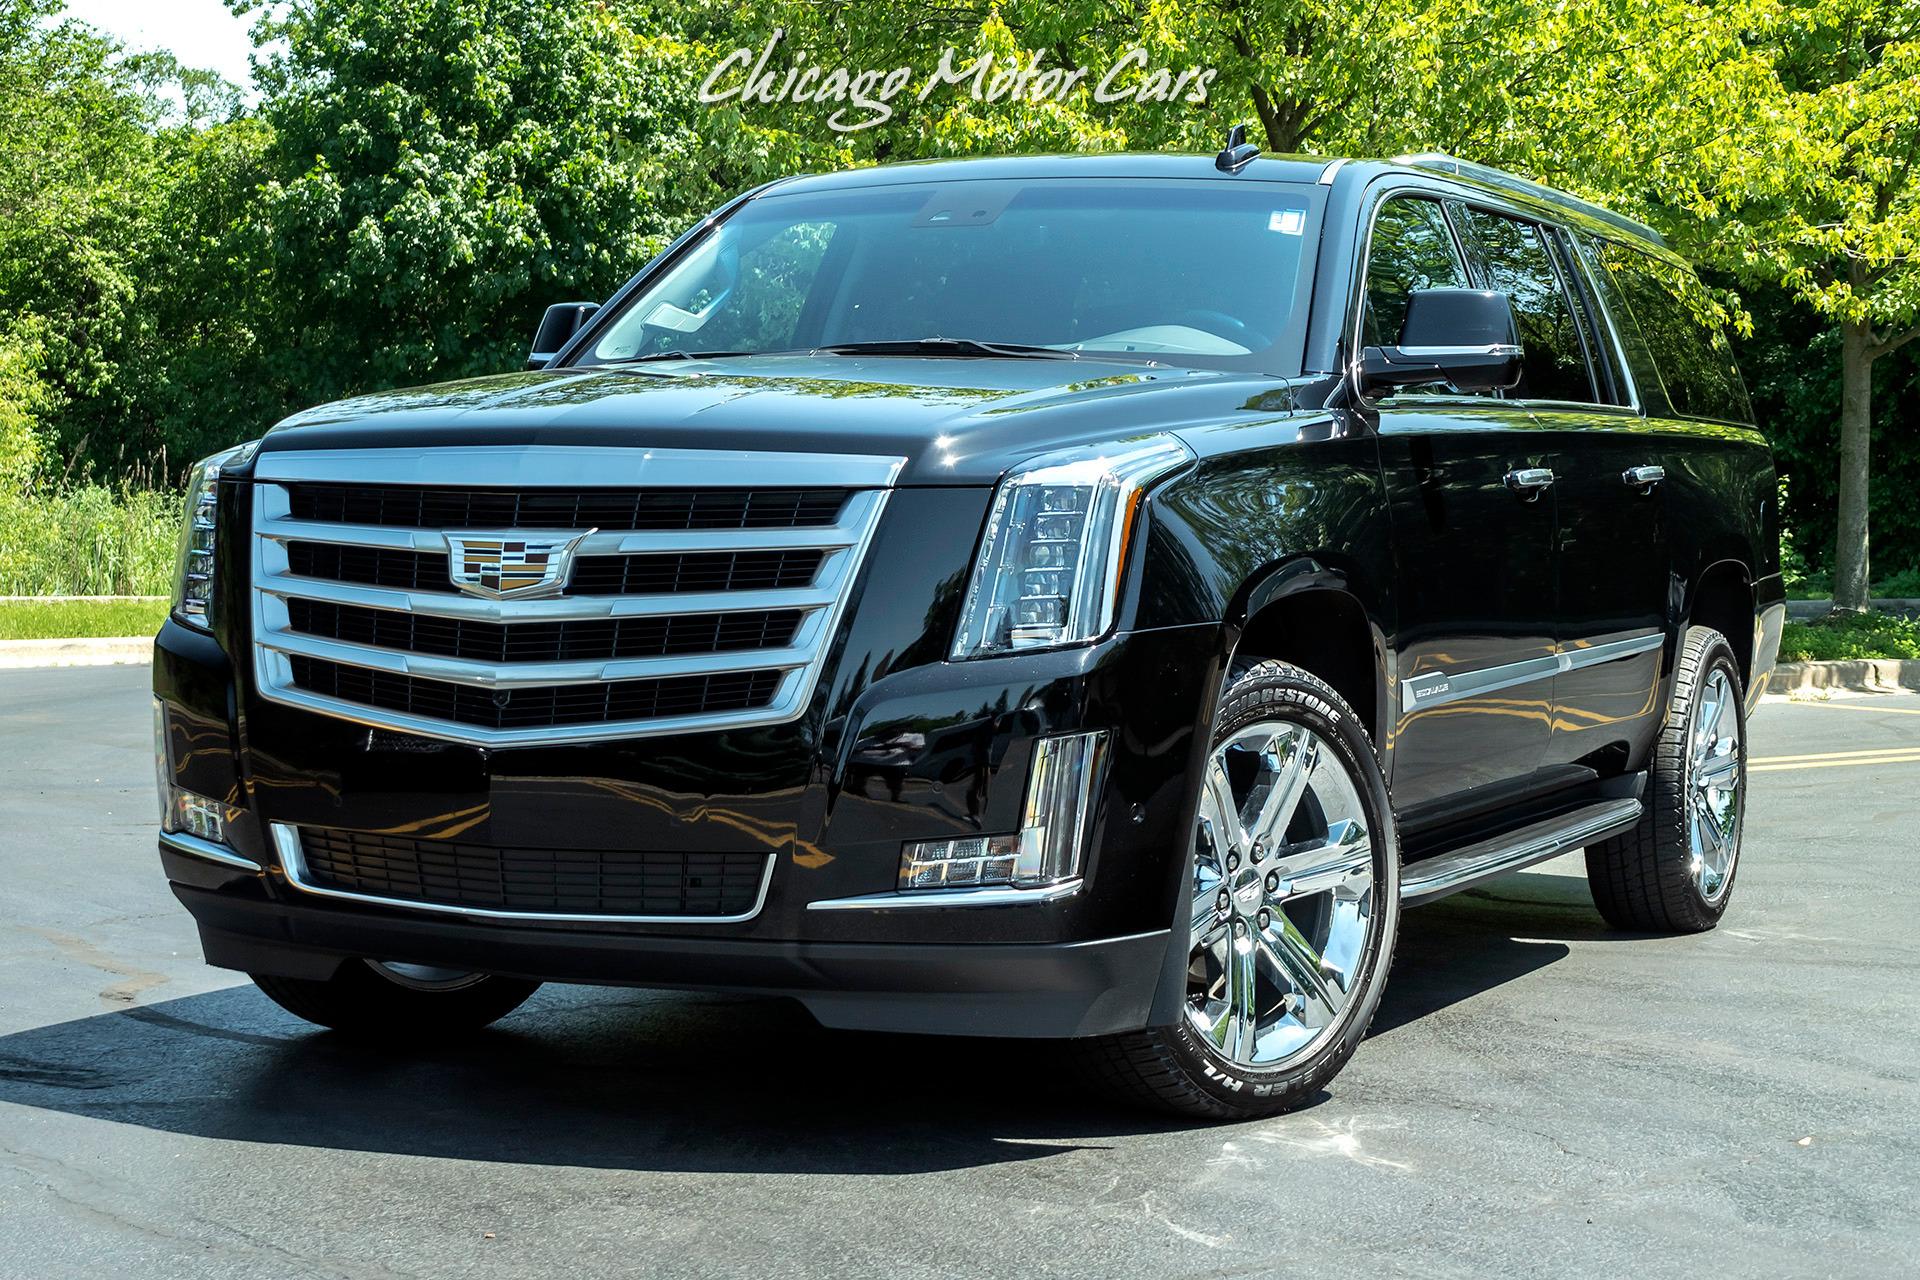 Used 2019 Cadillac Escalade ESV Luxury 4x4 For Sale ...